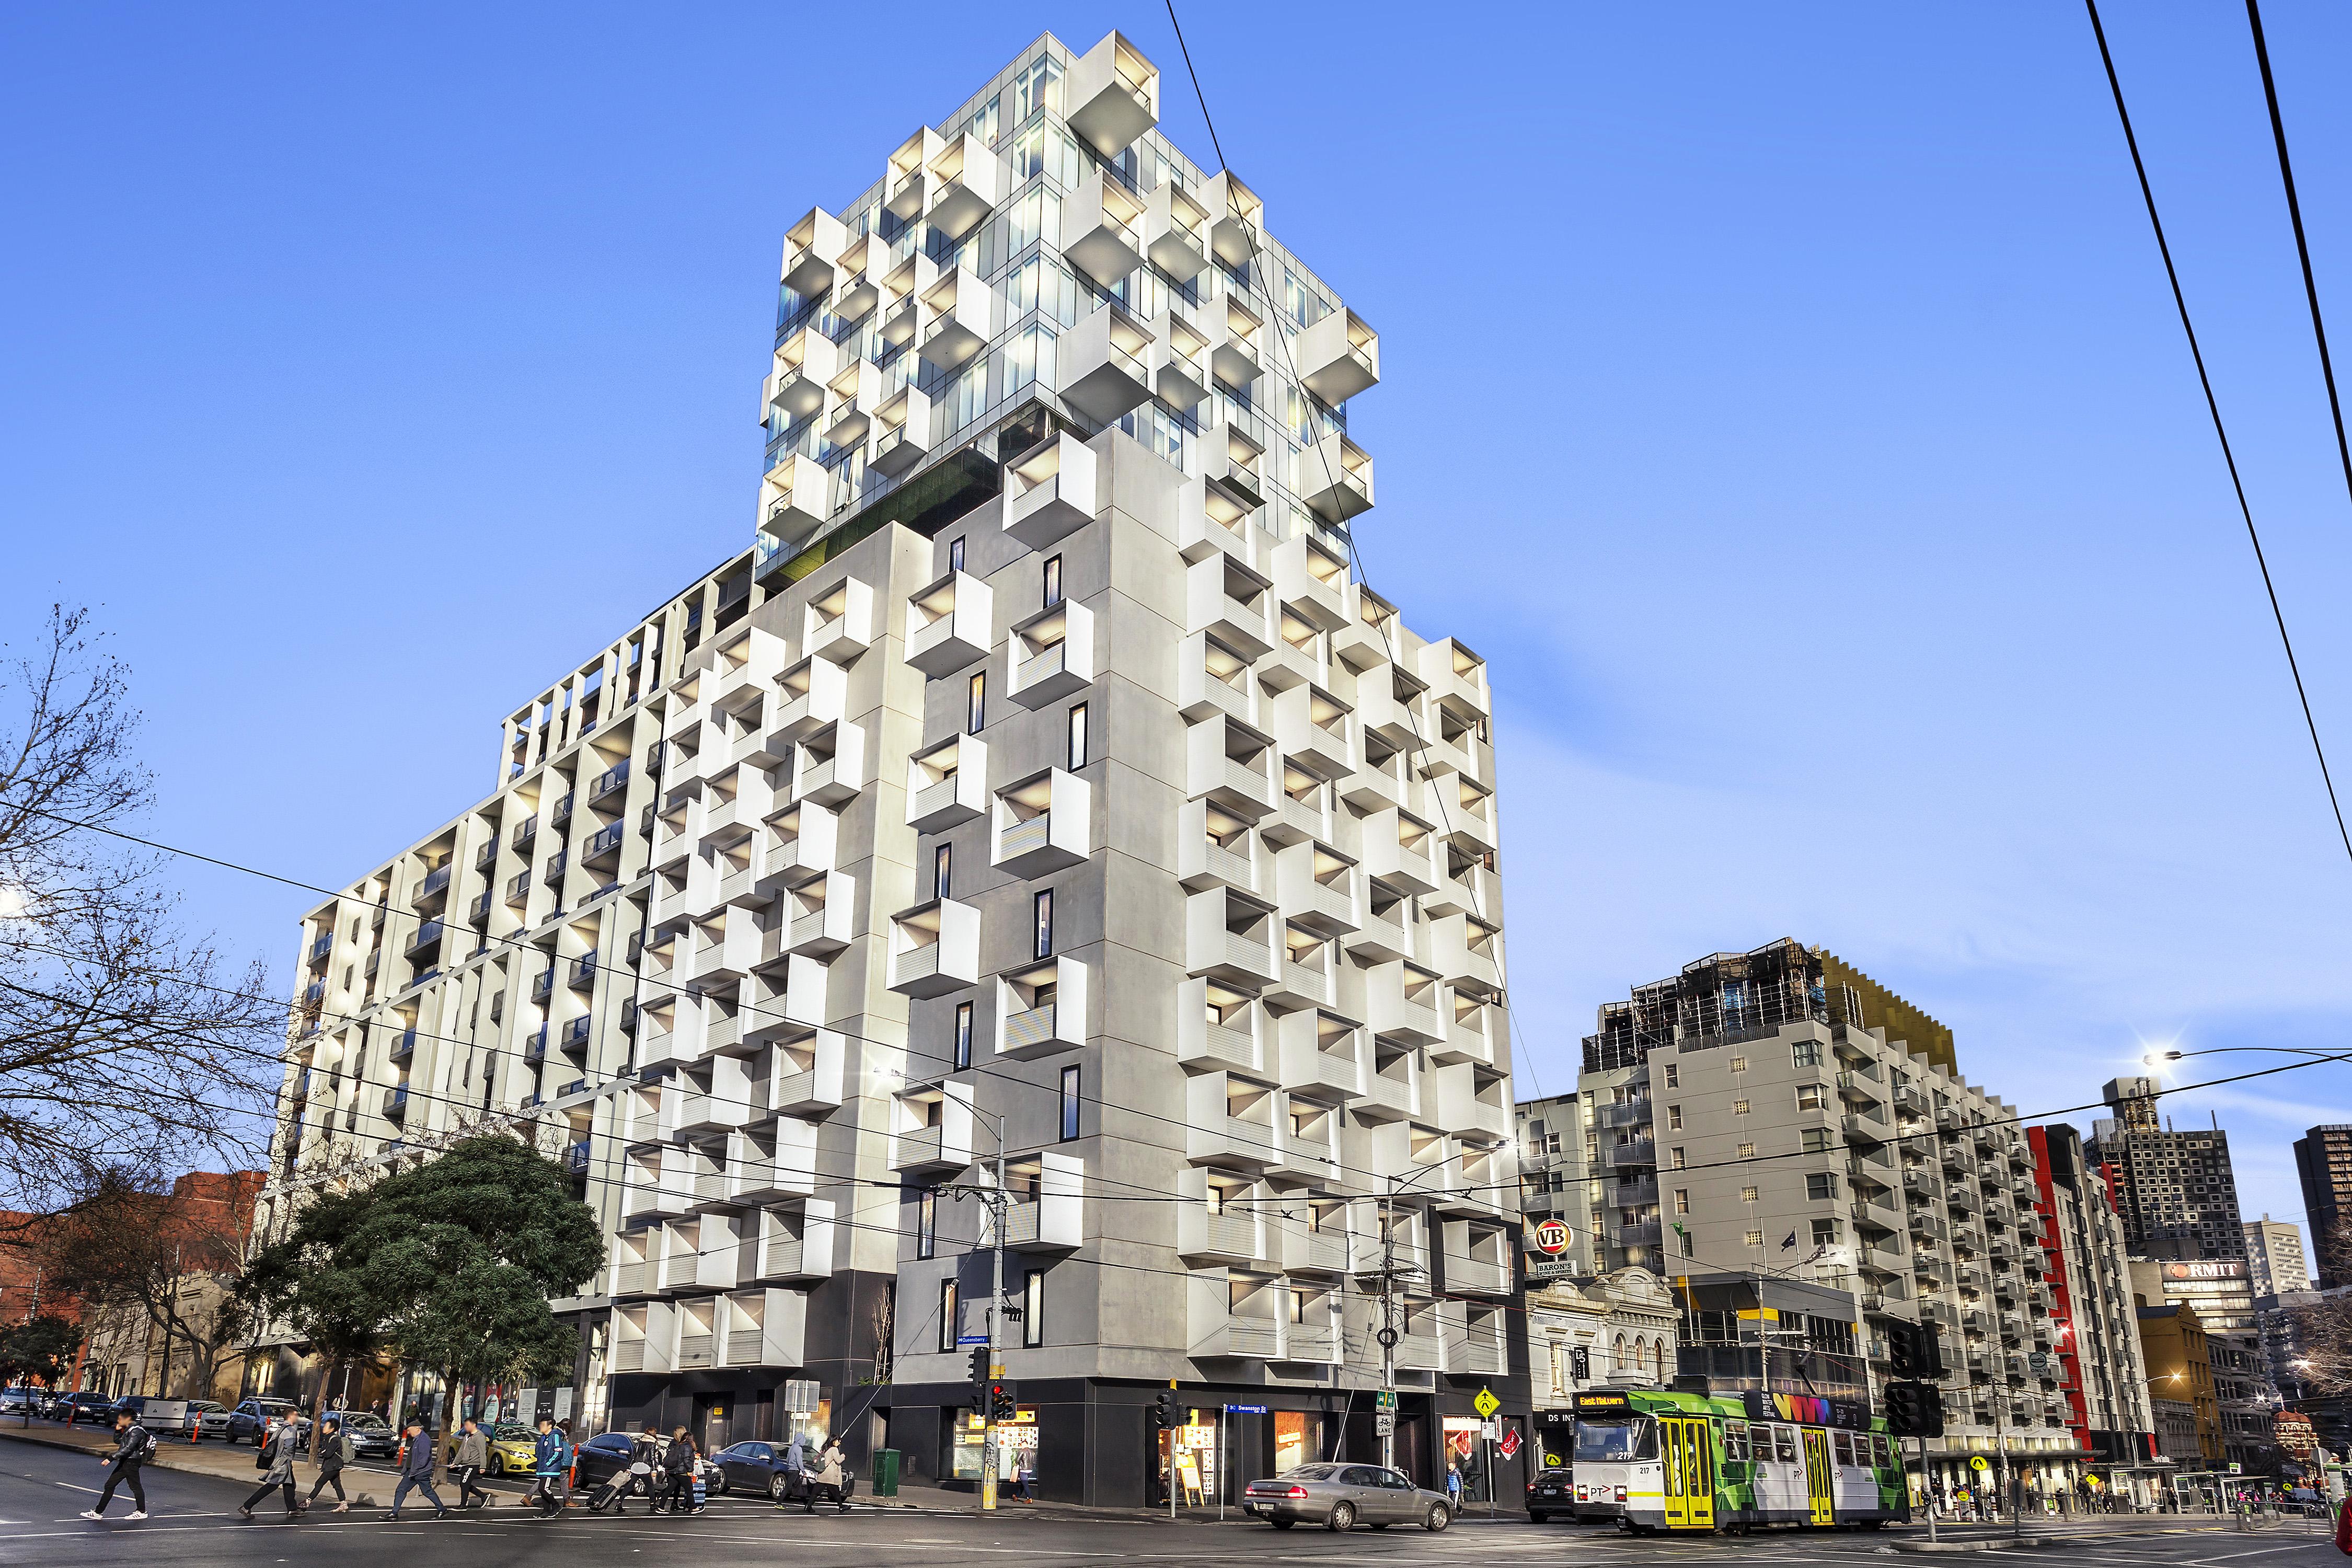 104-518-swanston-street-carlton-student-accommodation-Melbourne-Exterior-Unilodgers